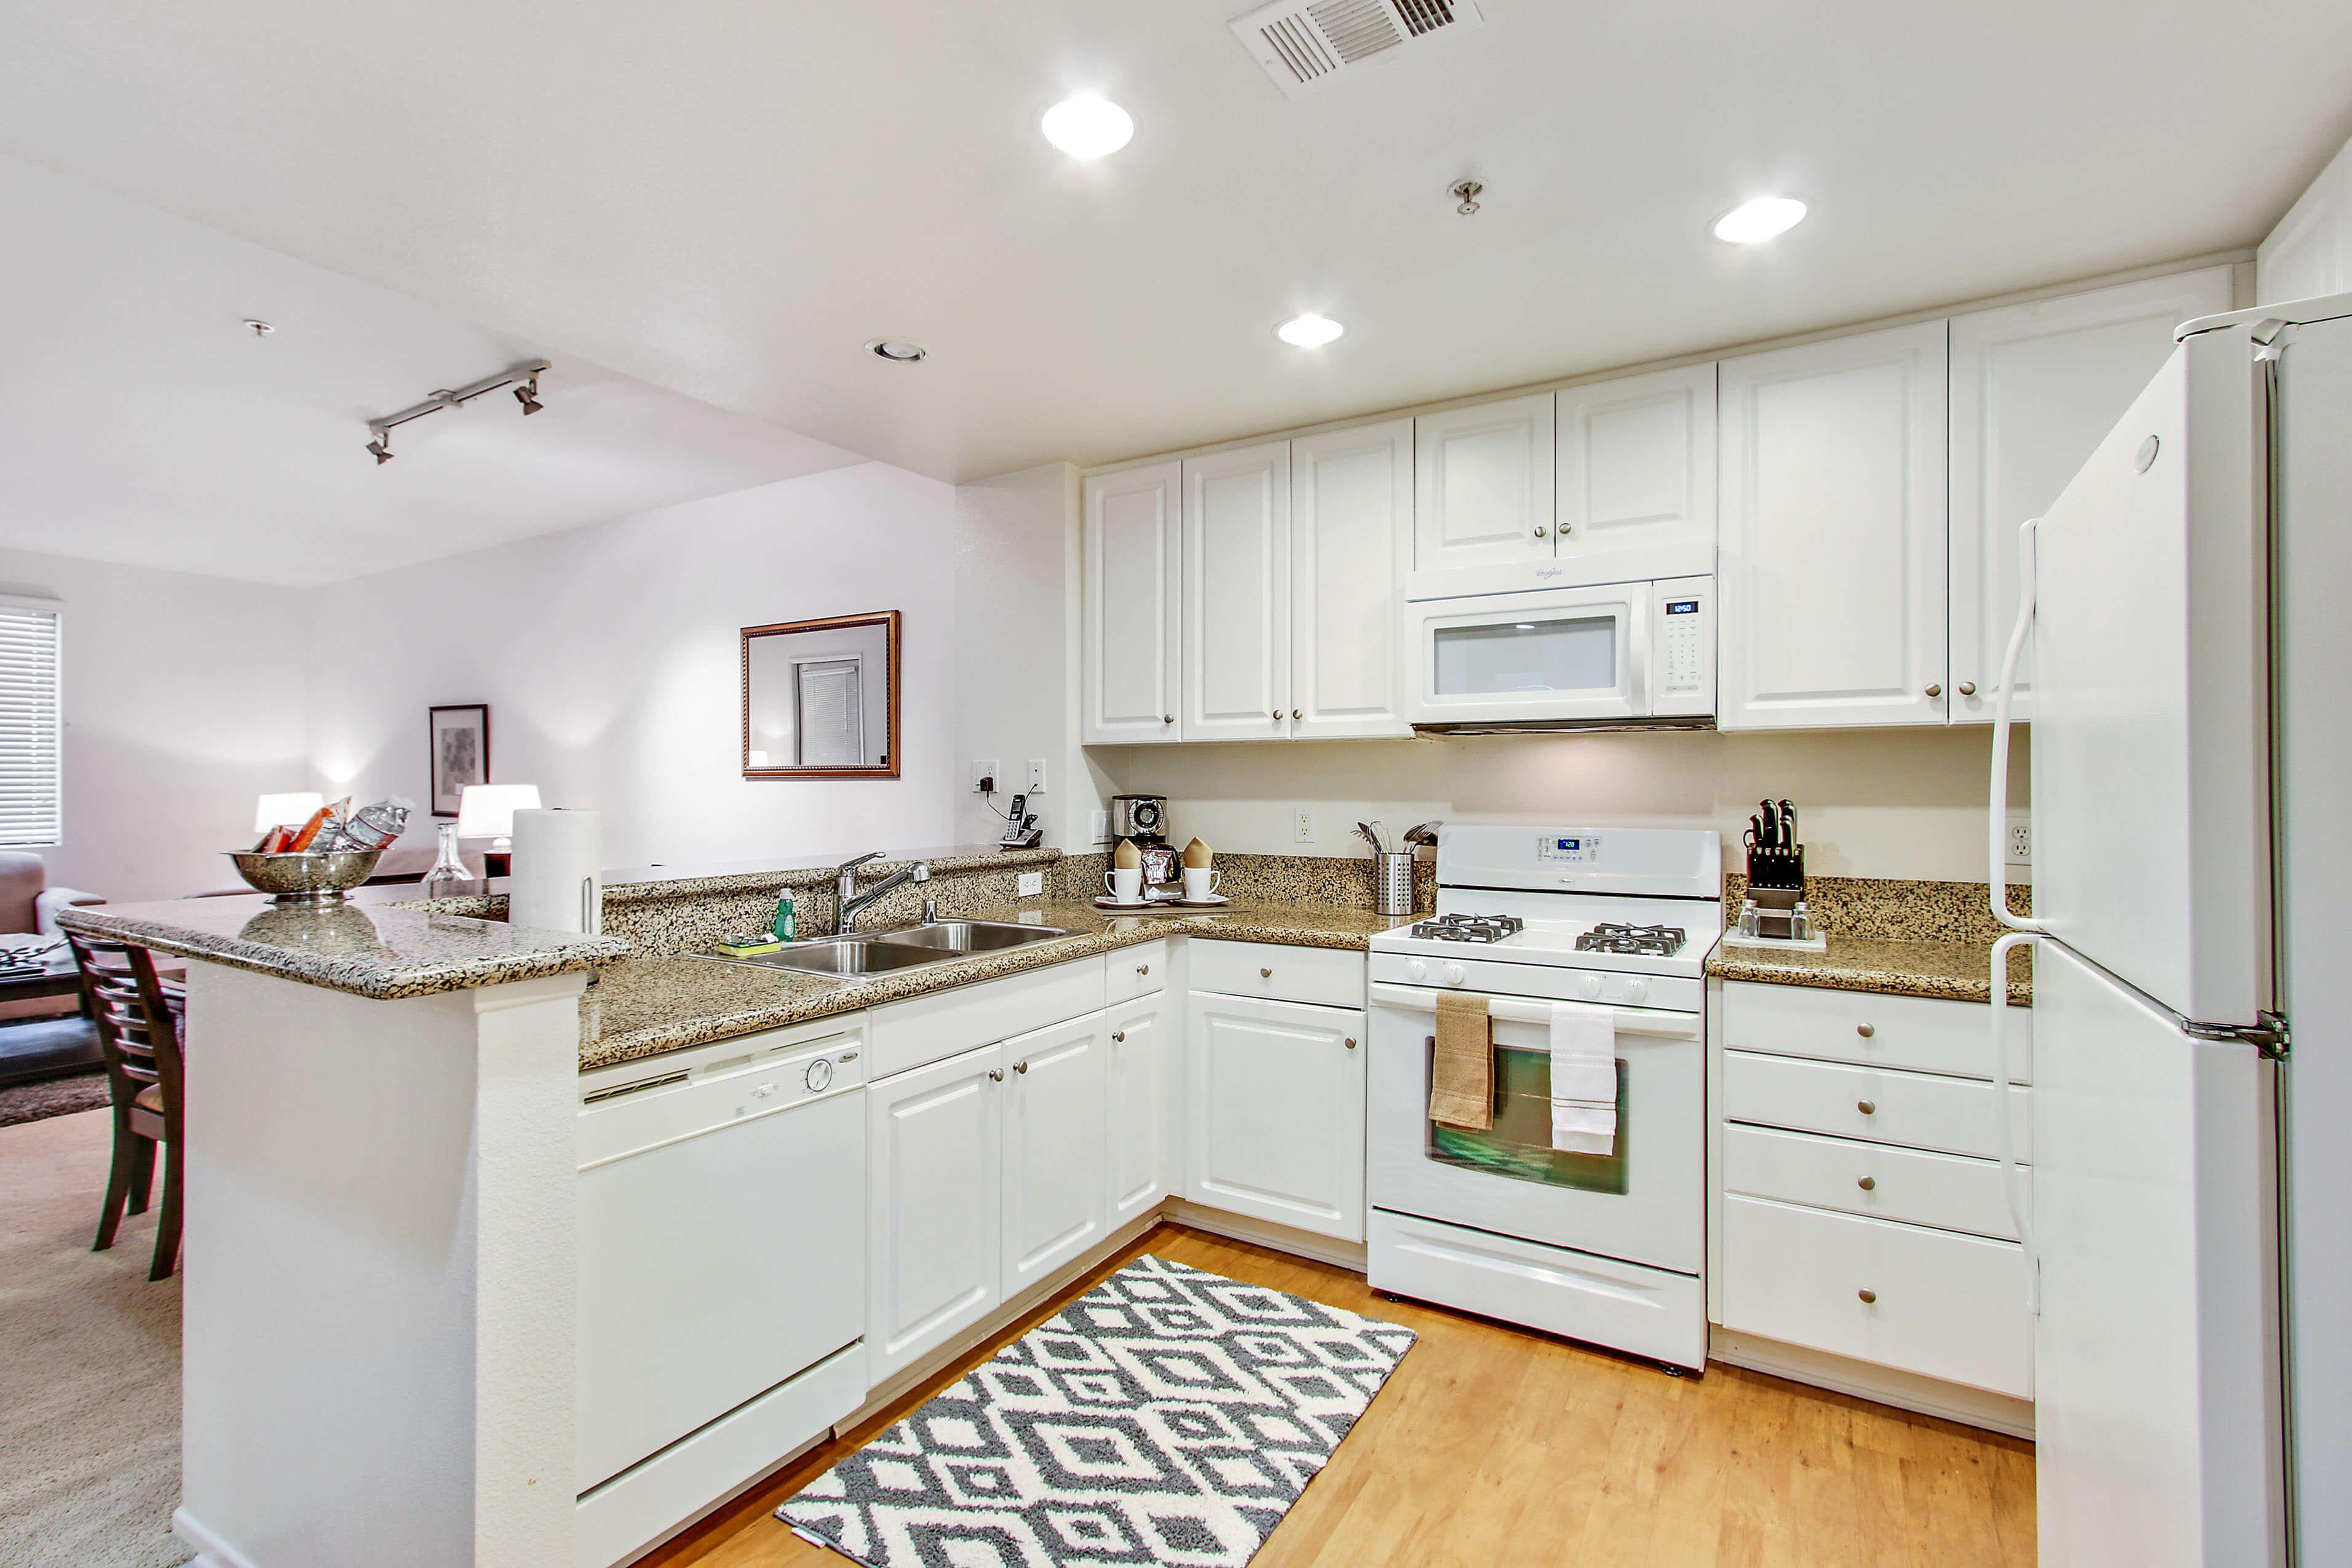 image 7 furnished 2 bedroom Apartment for rent in Irvine, Orange County